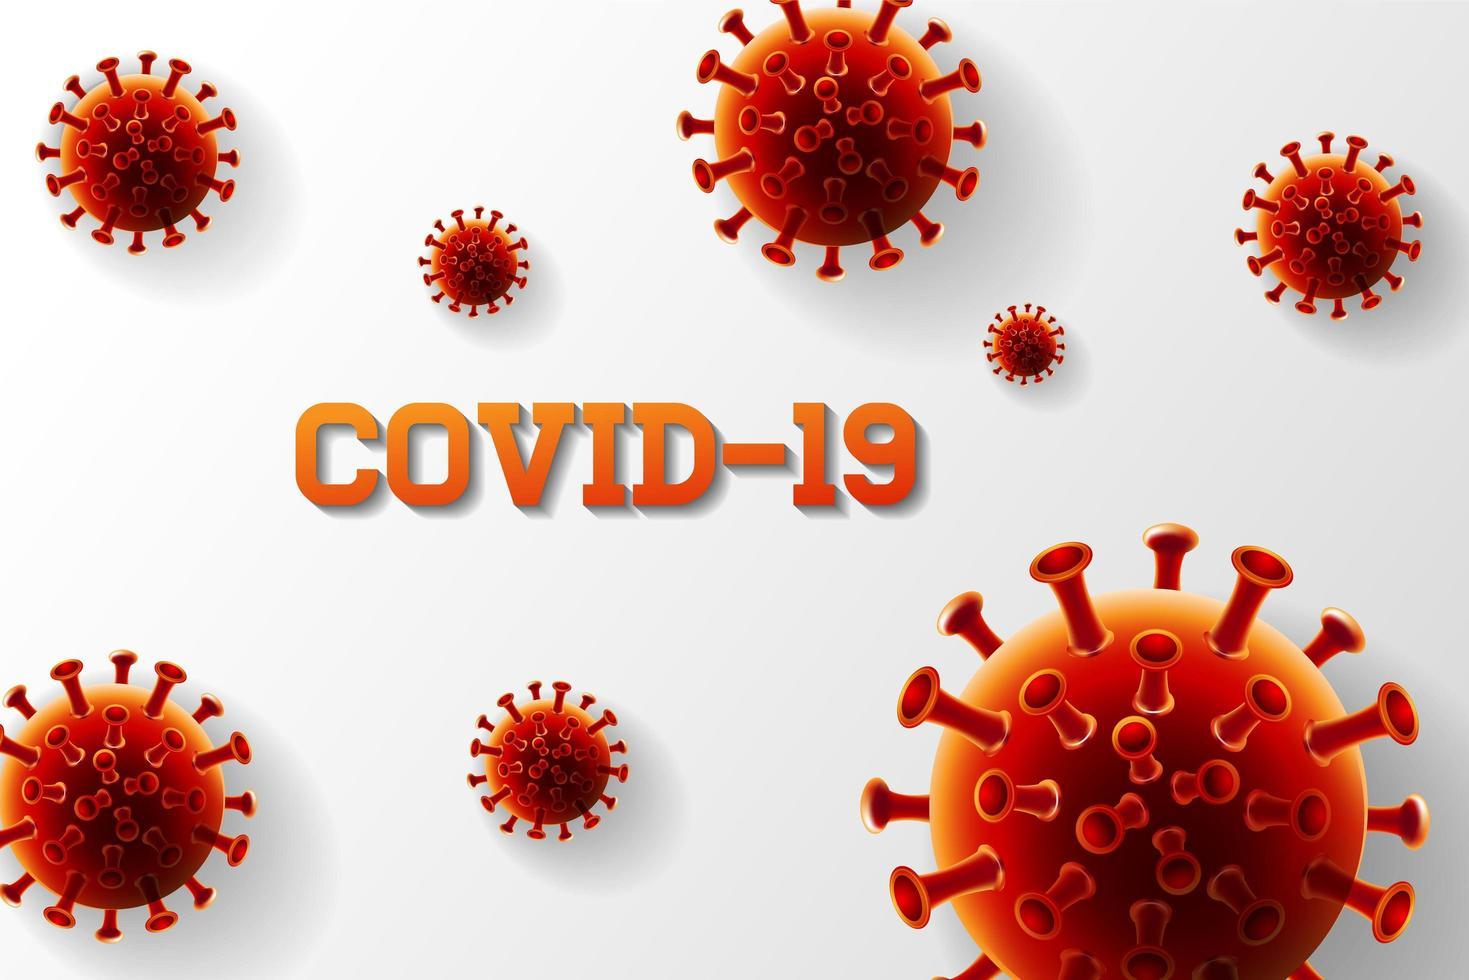 Доминикана COVID-19: статистика за 13 апреля